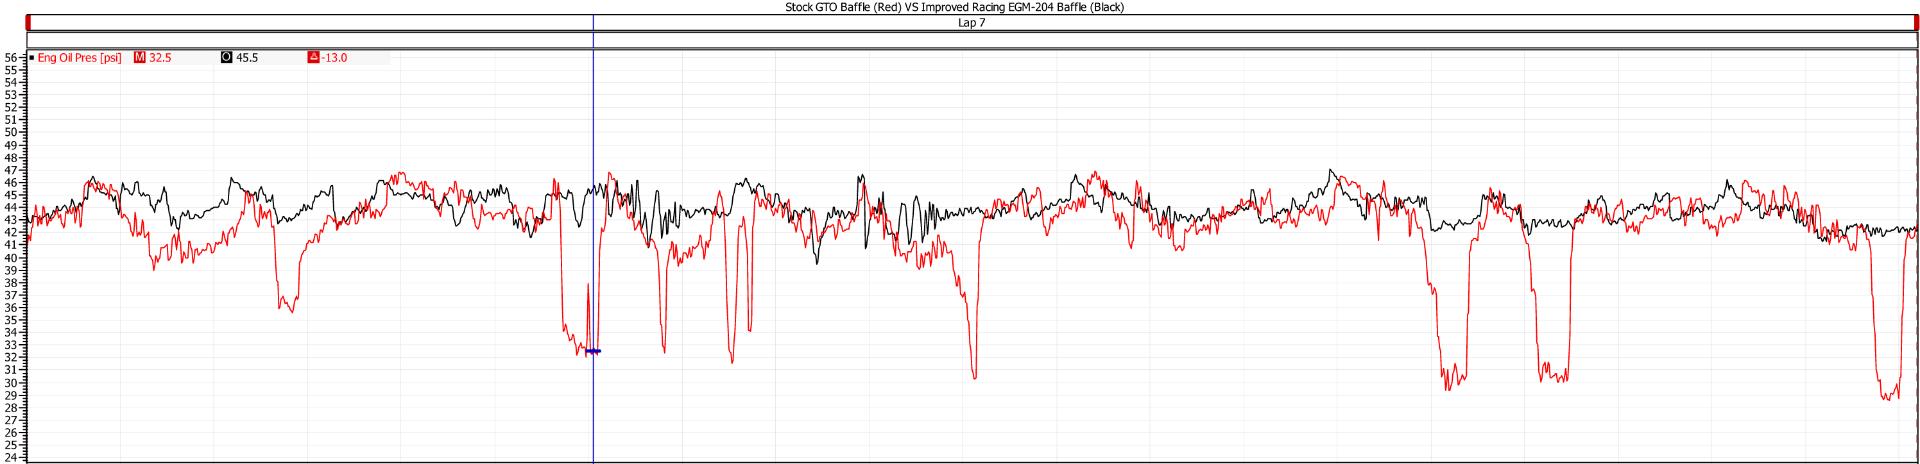 Improved Racing Oil Pan Baffle Data Log